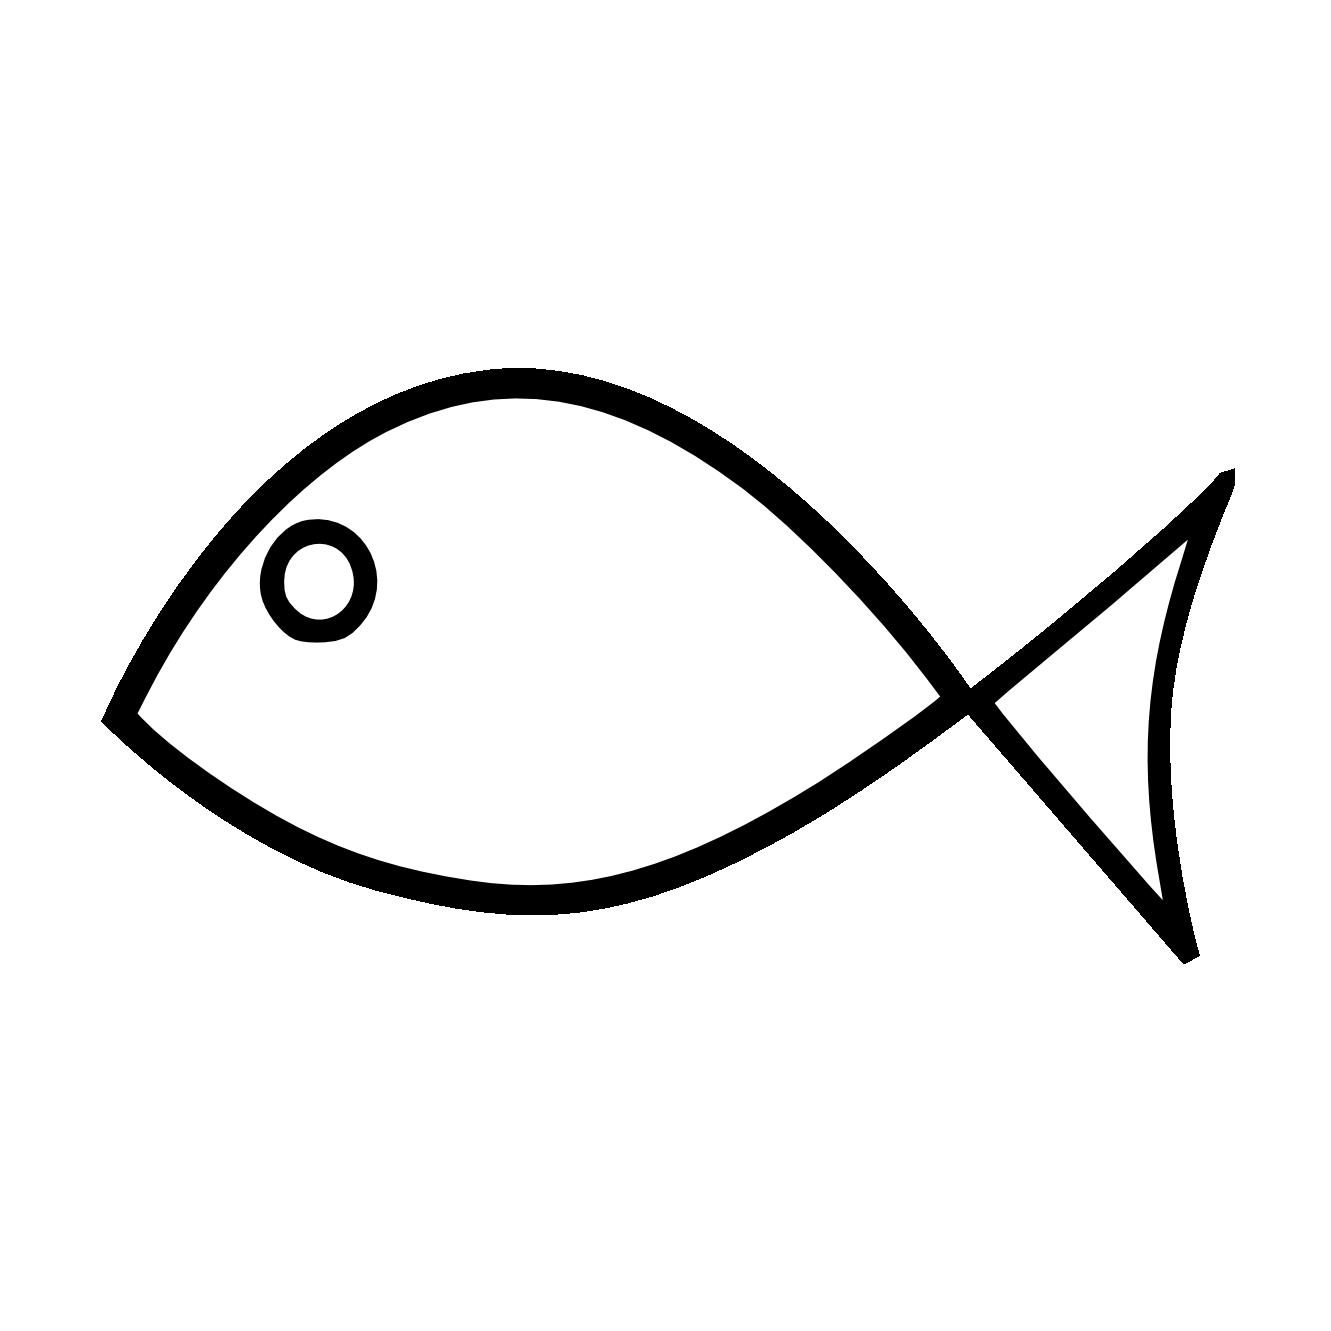 Fish Clip Art Black and White